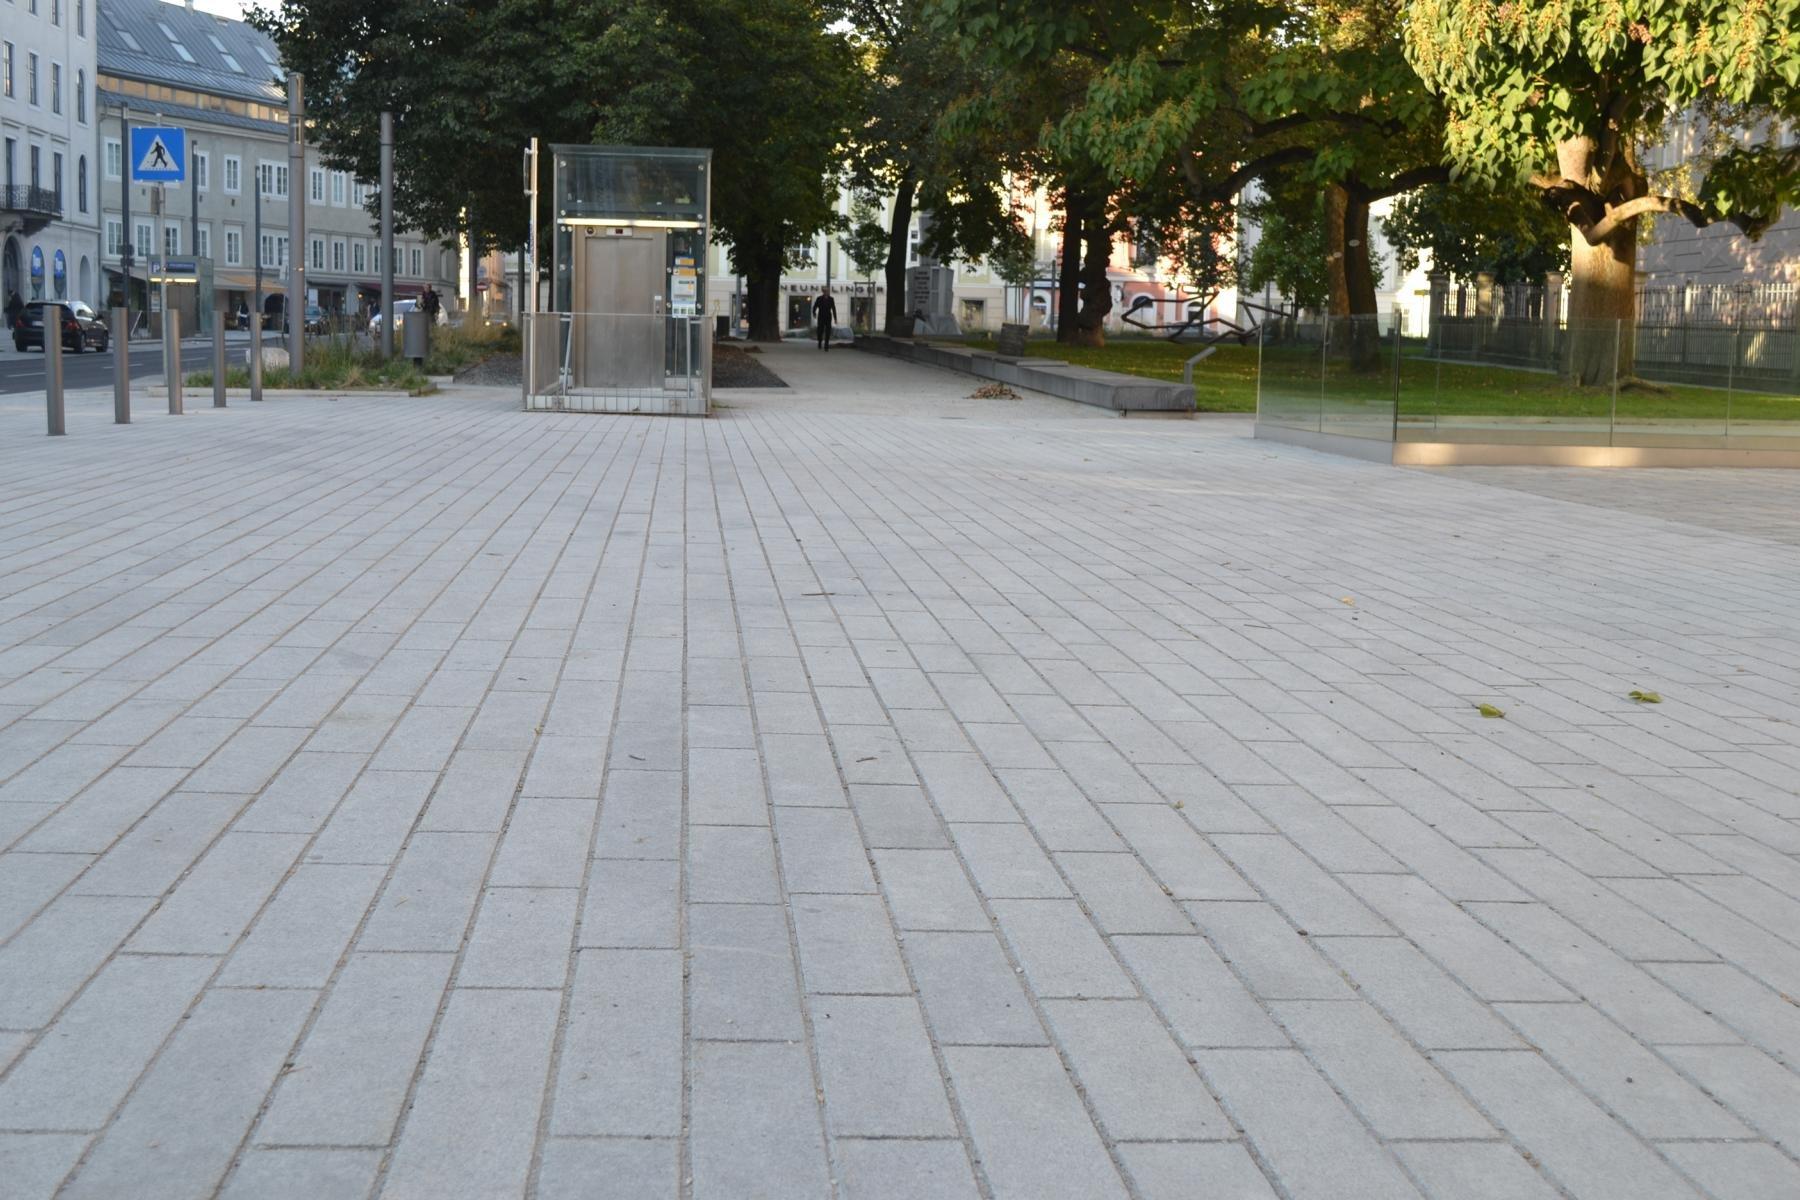 Linz - Promenade6